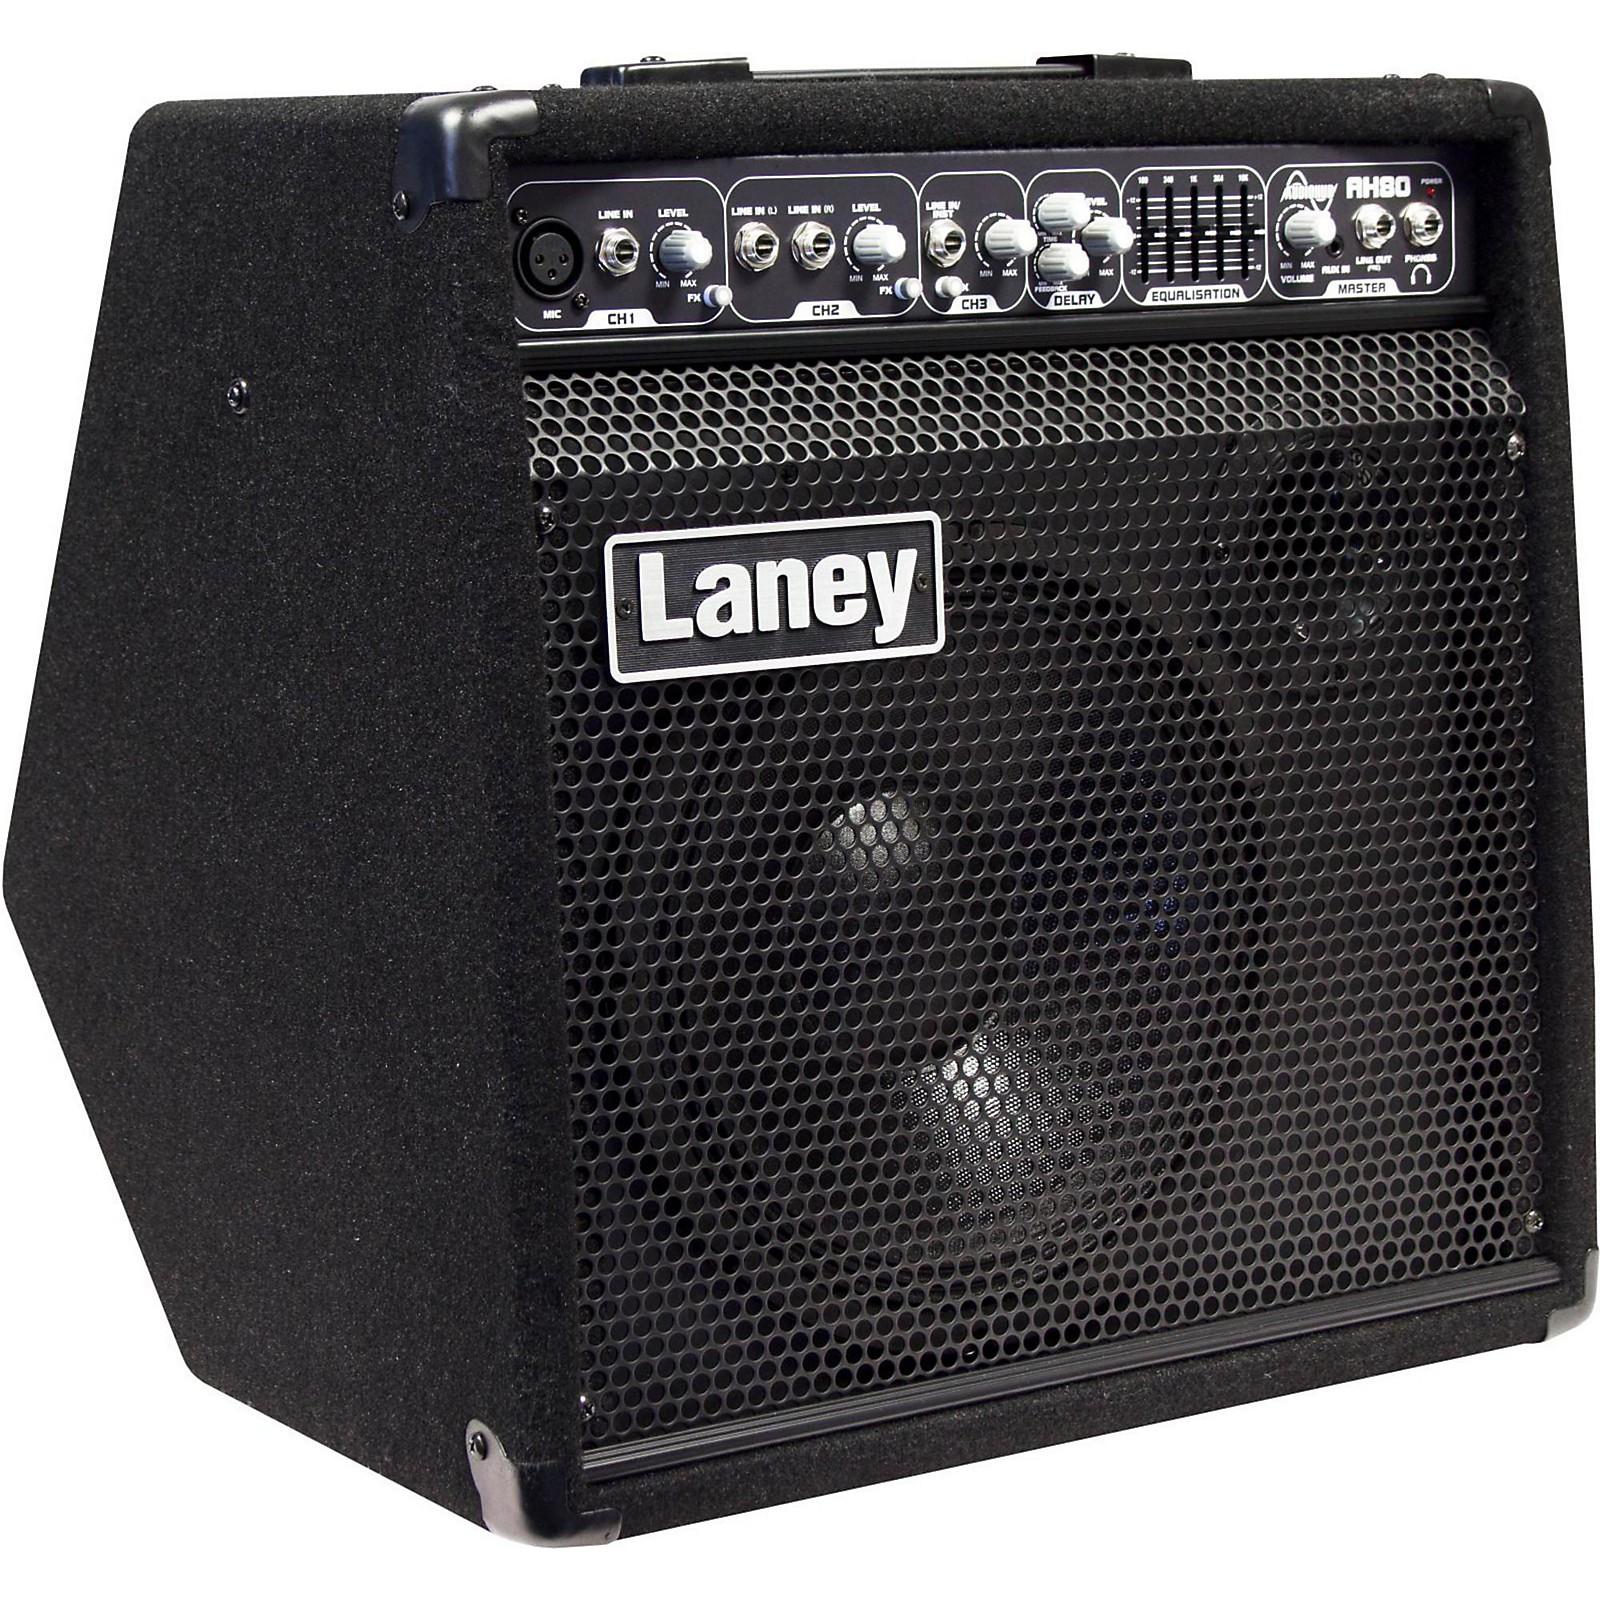 Laney AH 80 Audiohub Combo